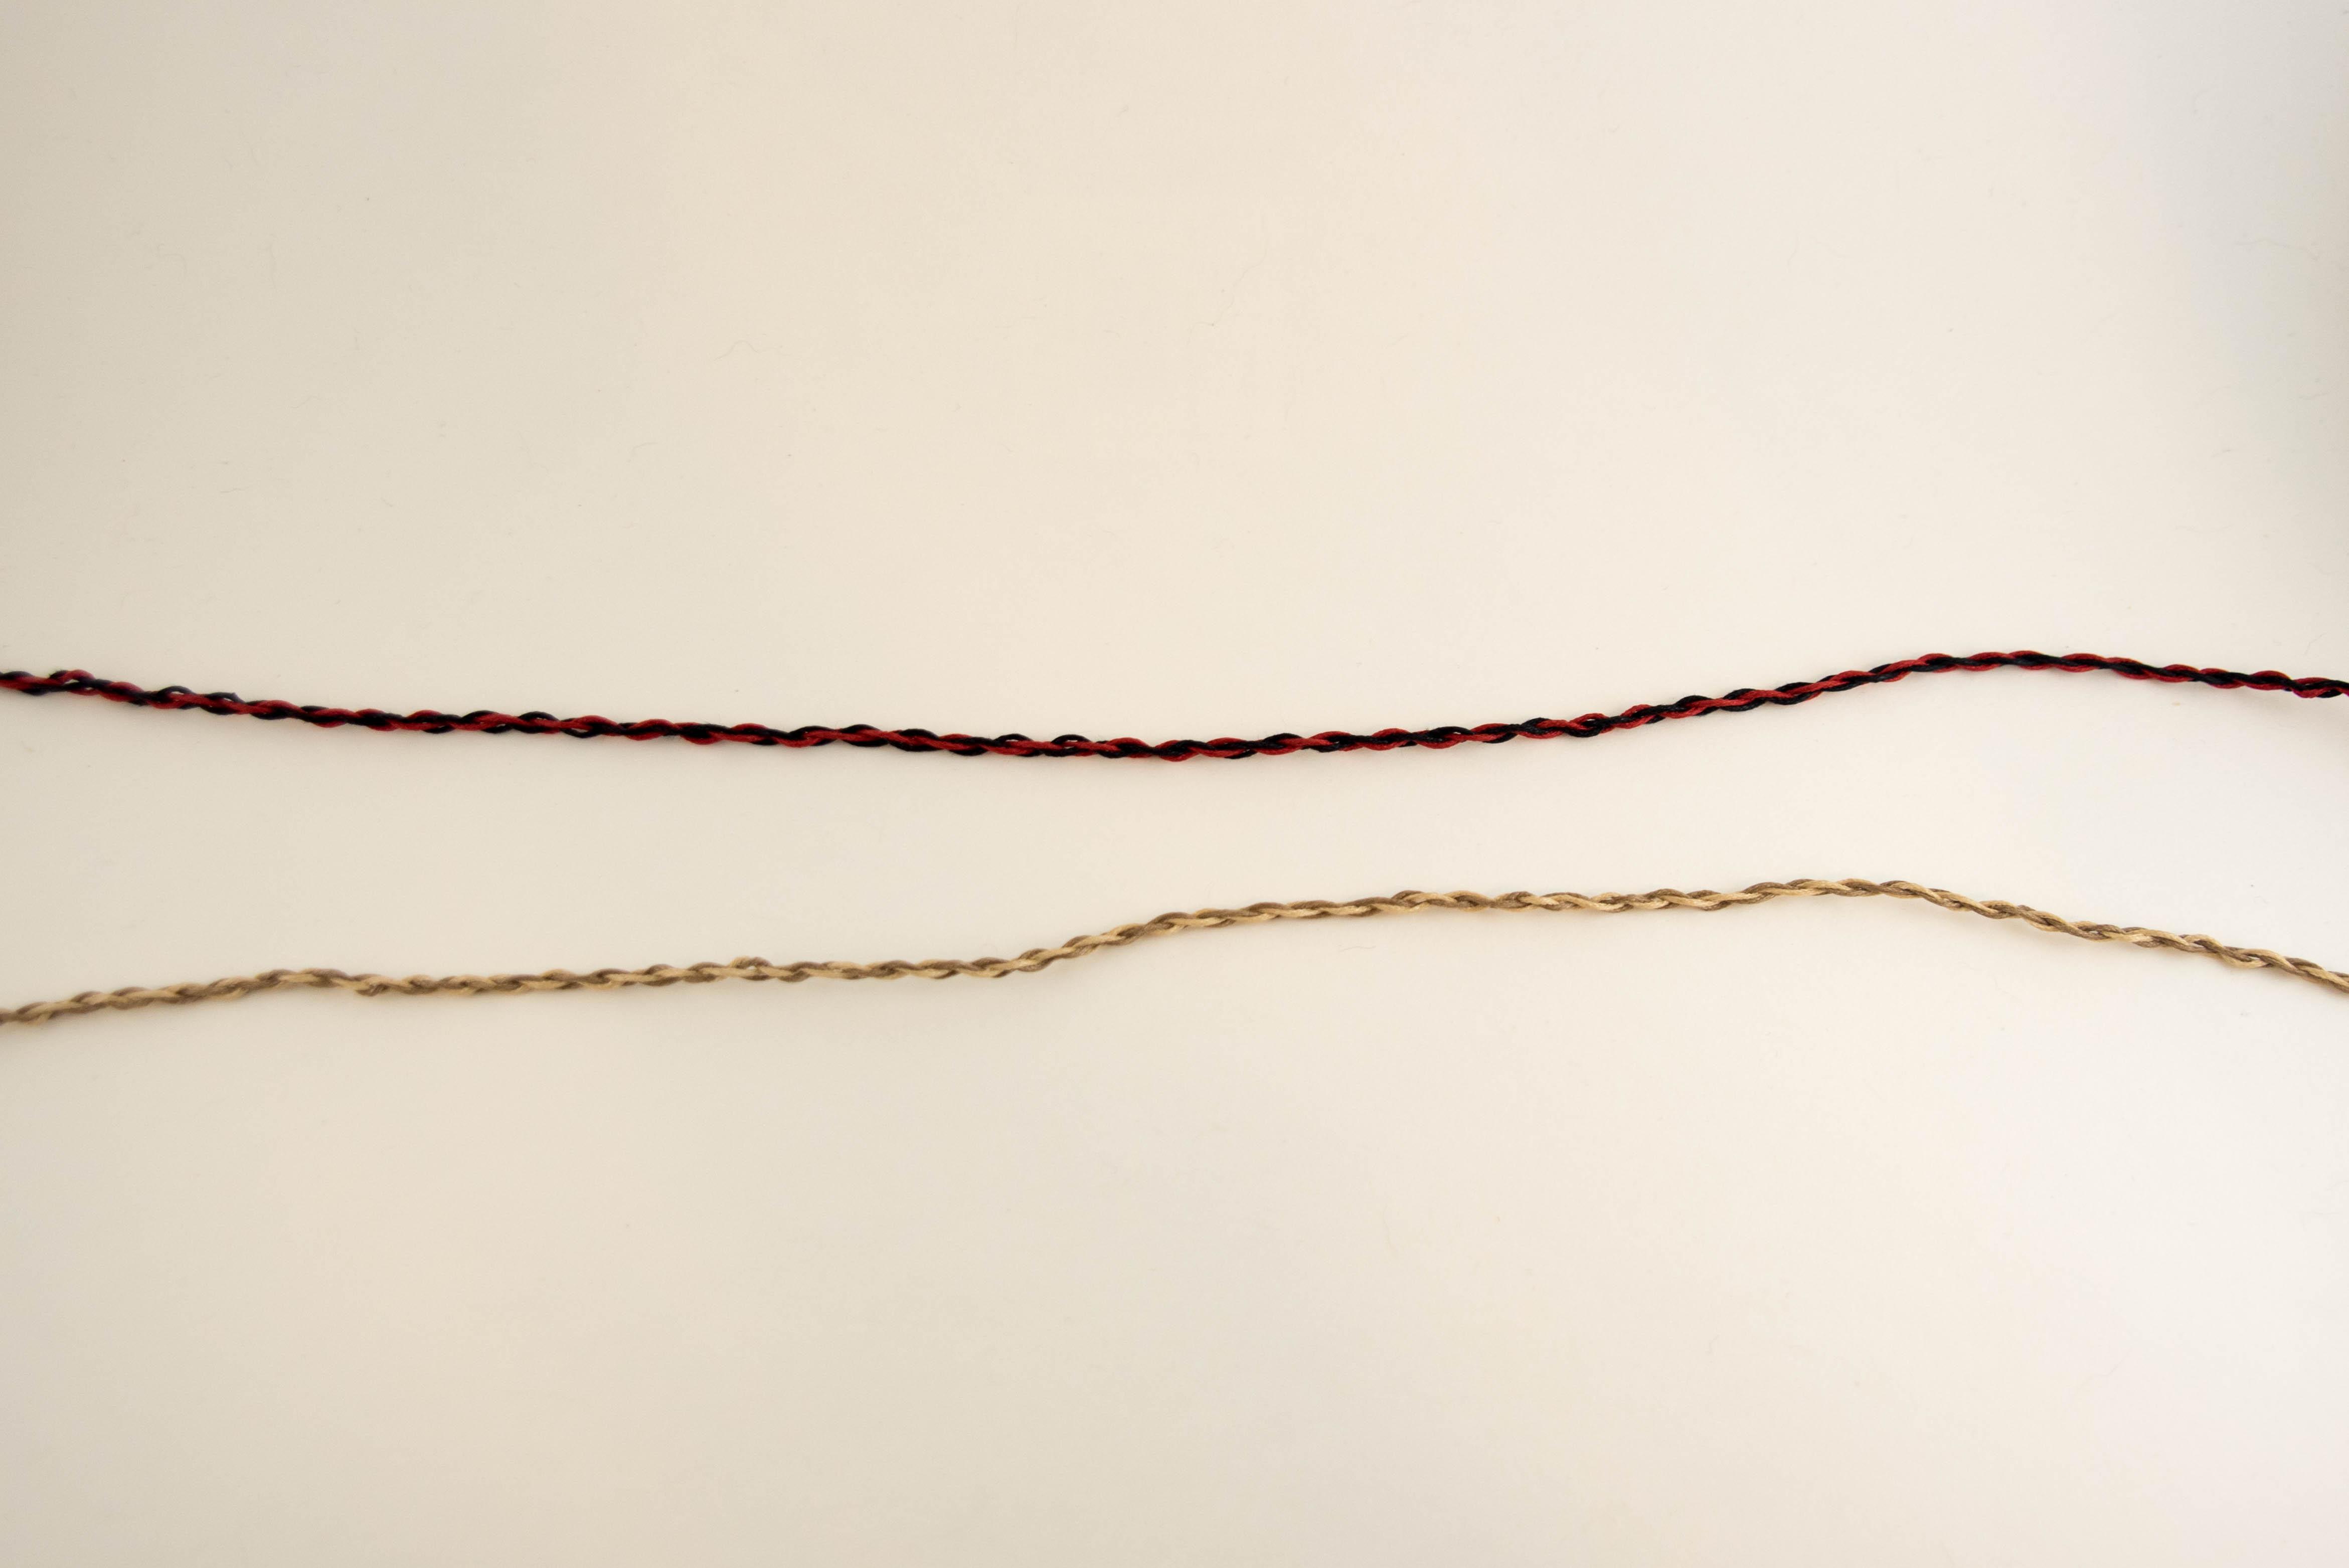 diy twisted cord